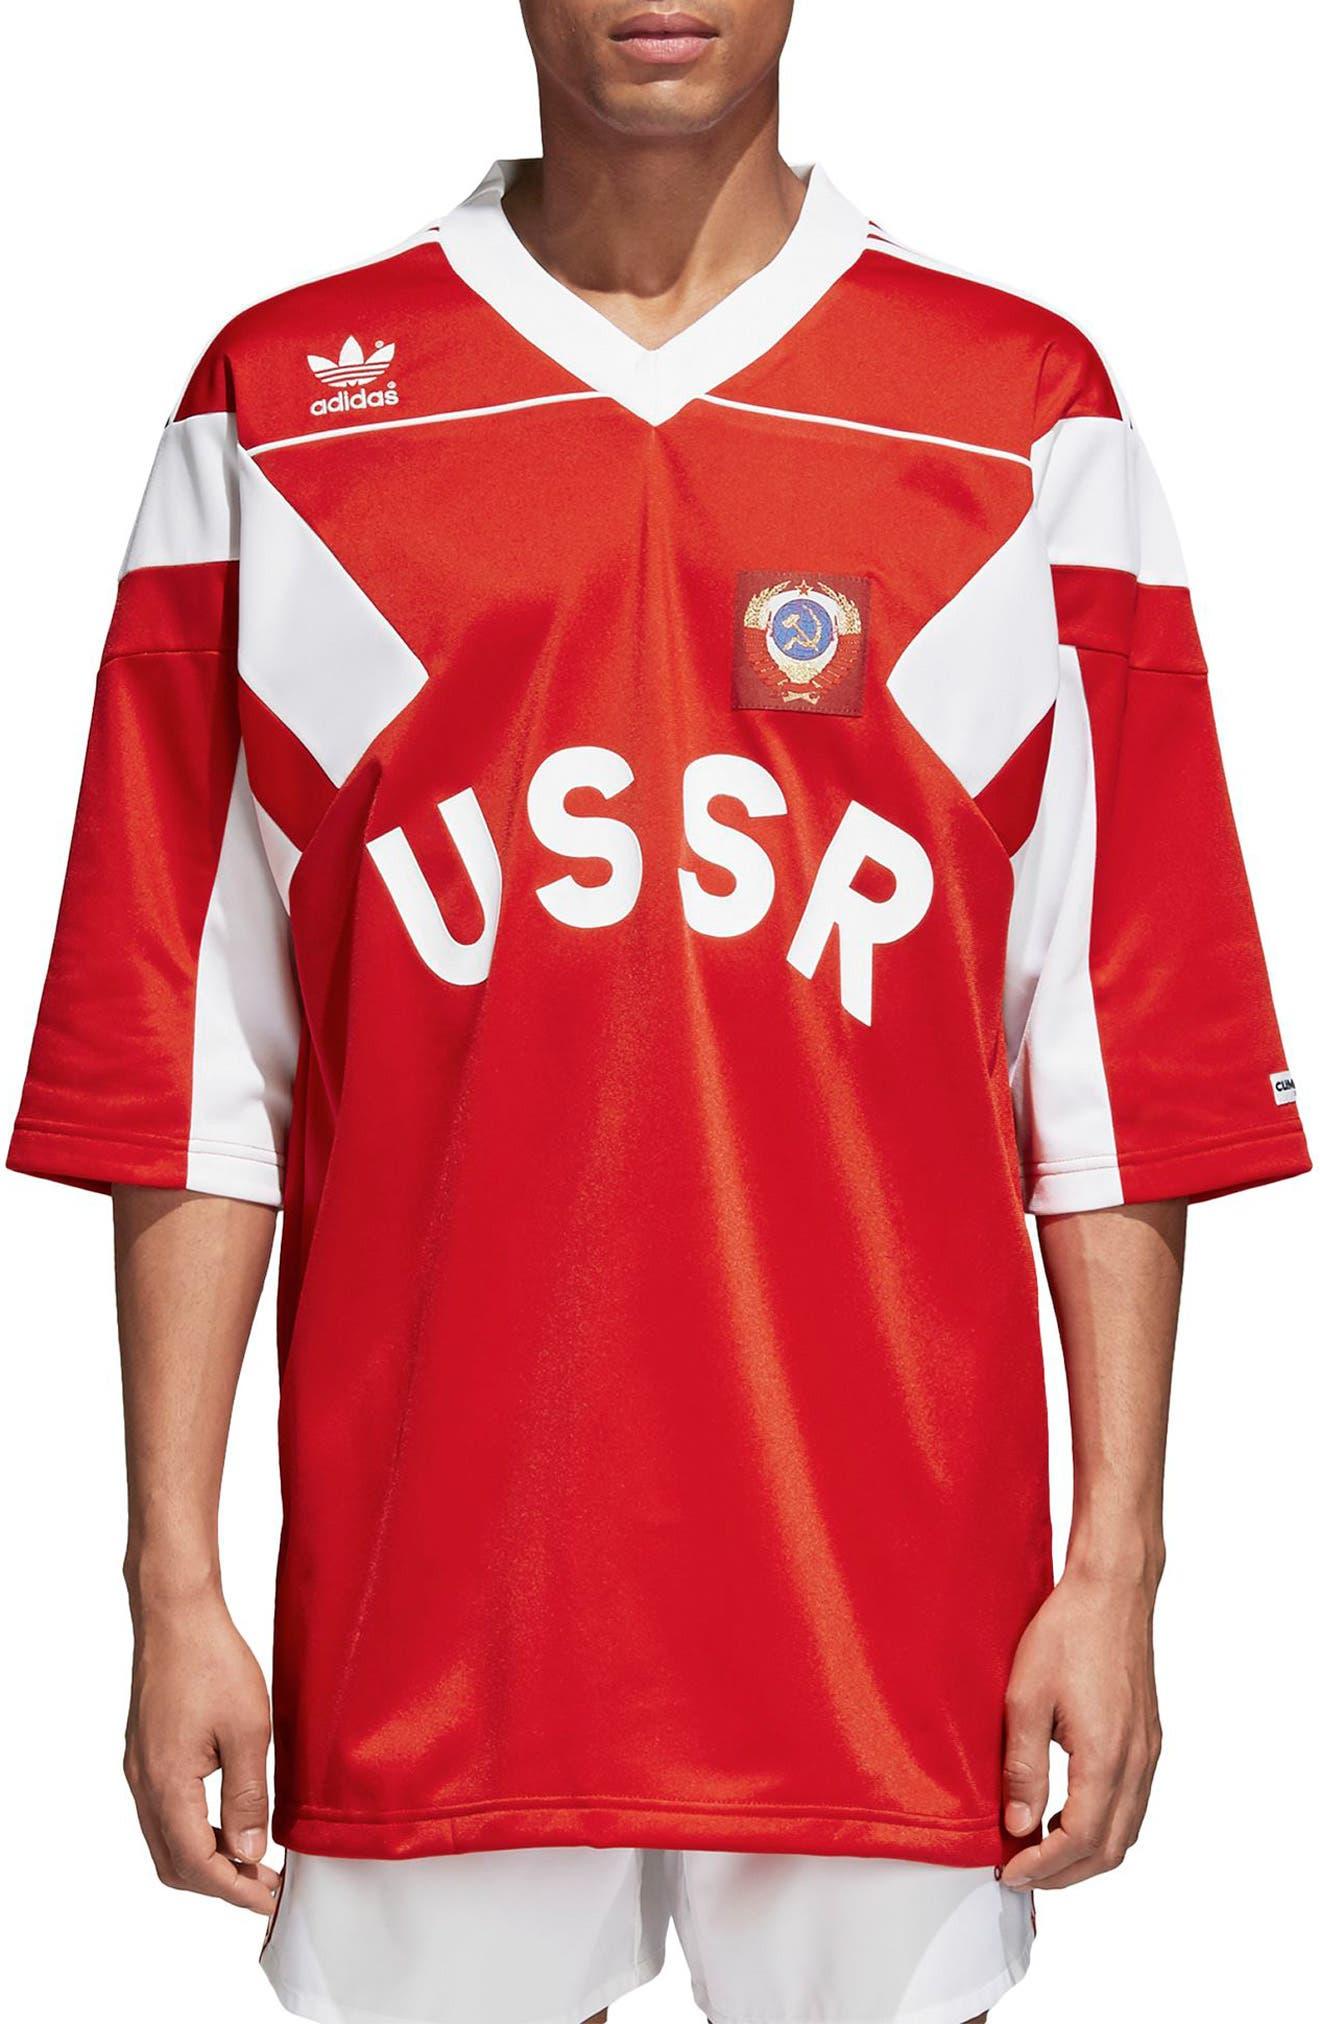 adidas Original Russia 1991 Soccer Jersey, Main, color, 610